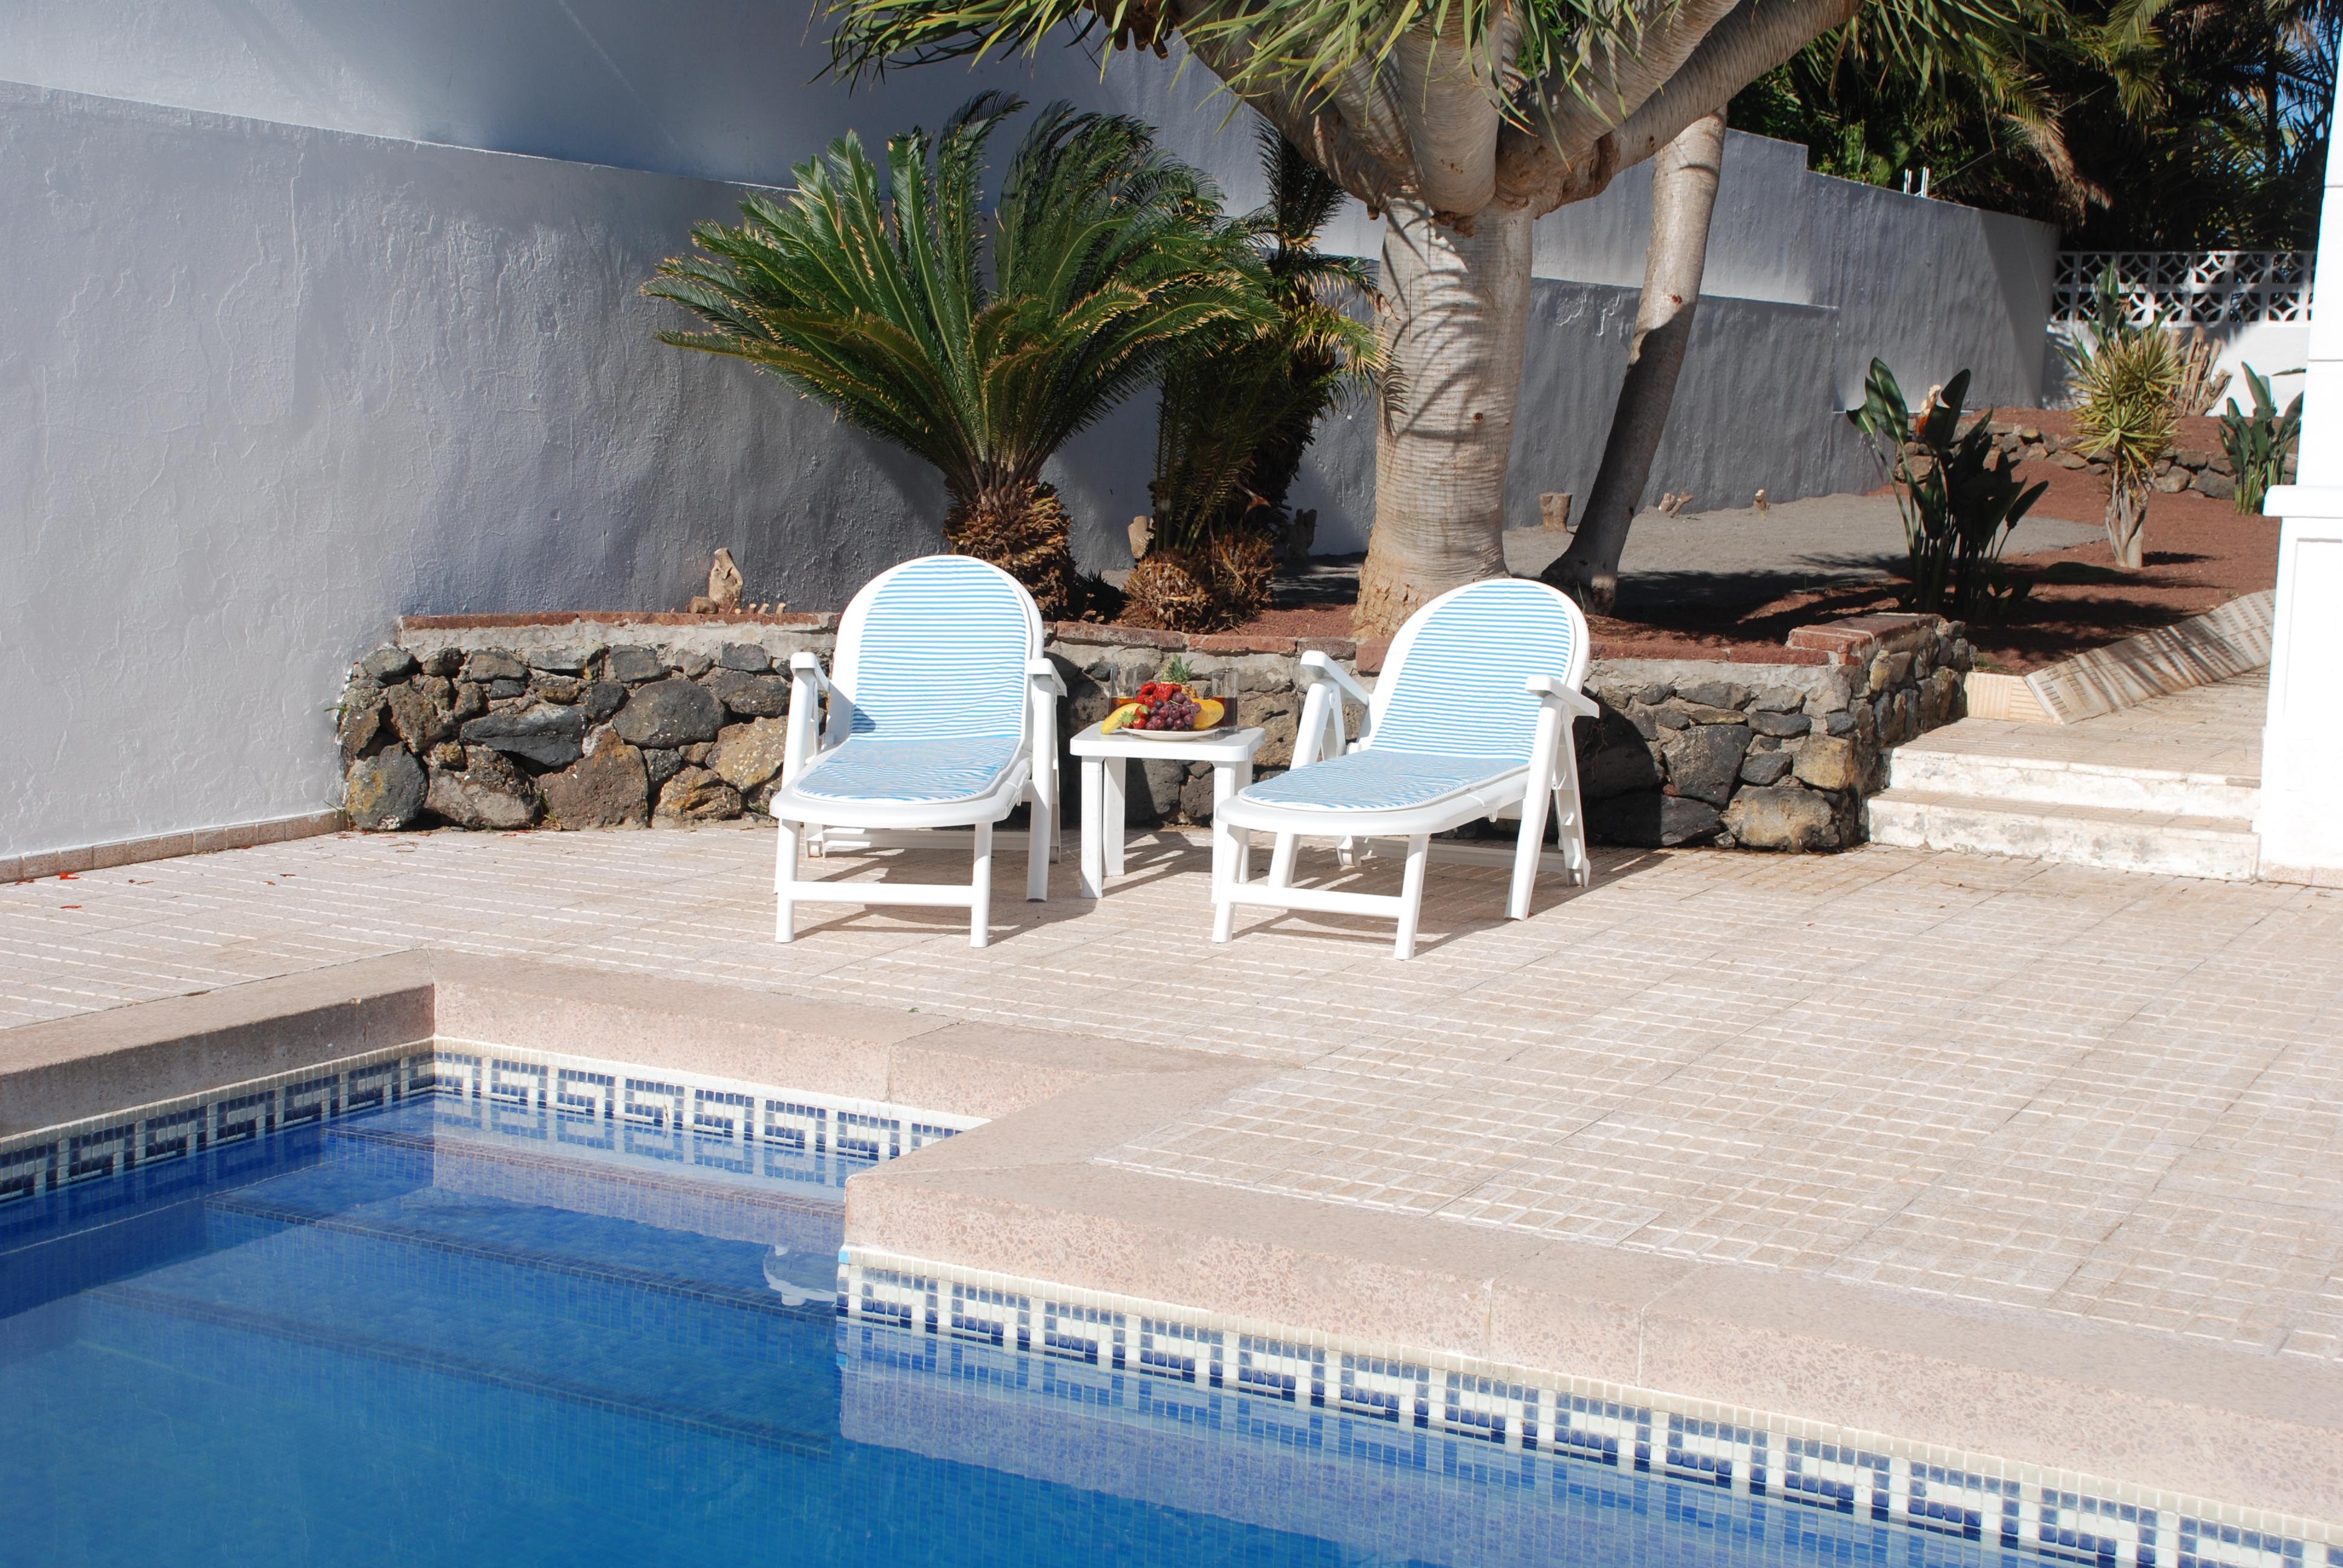 Maison de vacances Villa Vista La Quinta beheizbarer Pool kostenloses WLAN Grill (2124407), Santa Ursula, Ténérife, Iles Canaries, Espagne, image 84